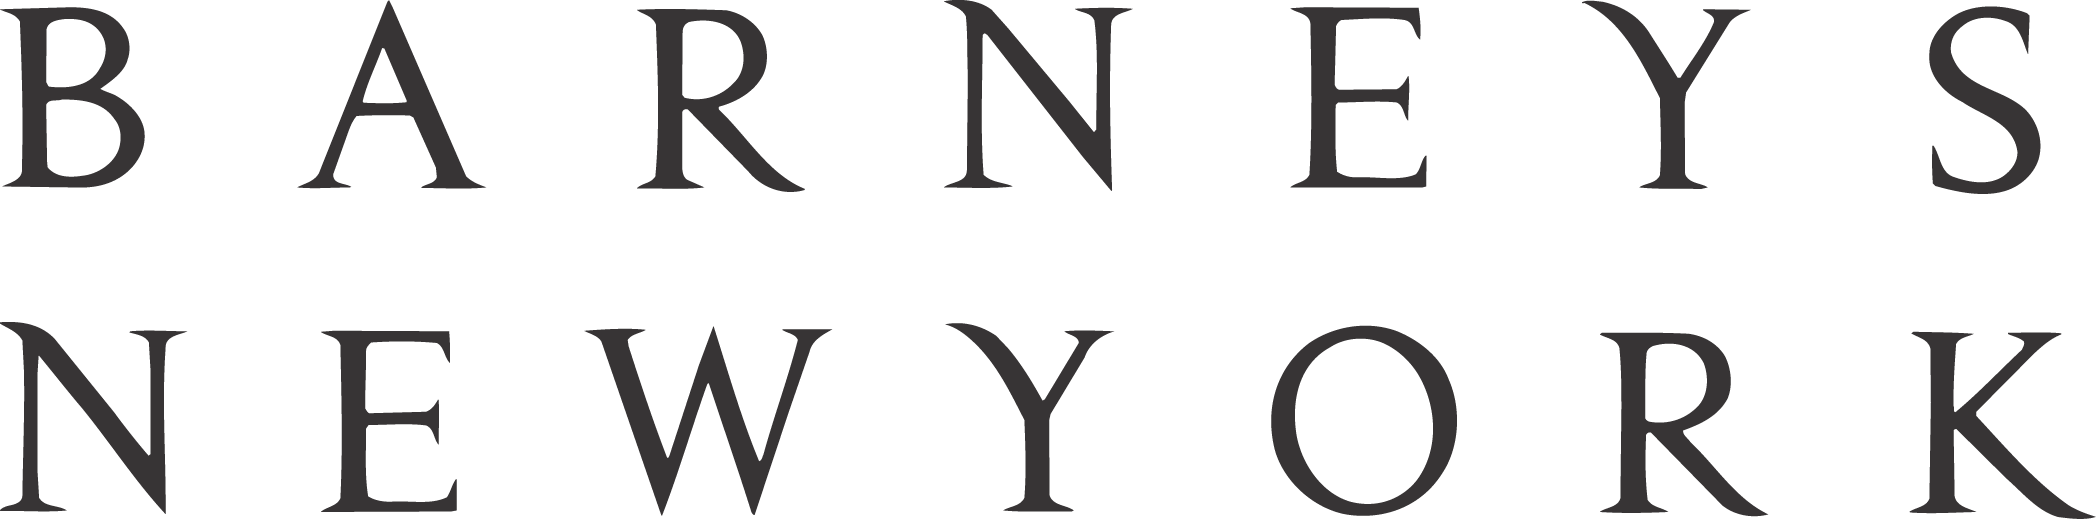 Barneys Logo [New York] png